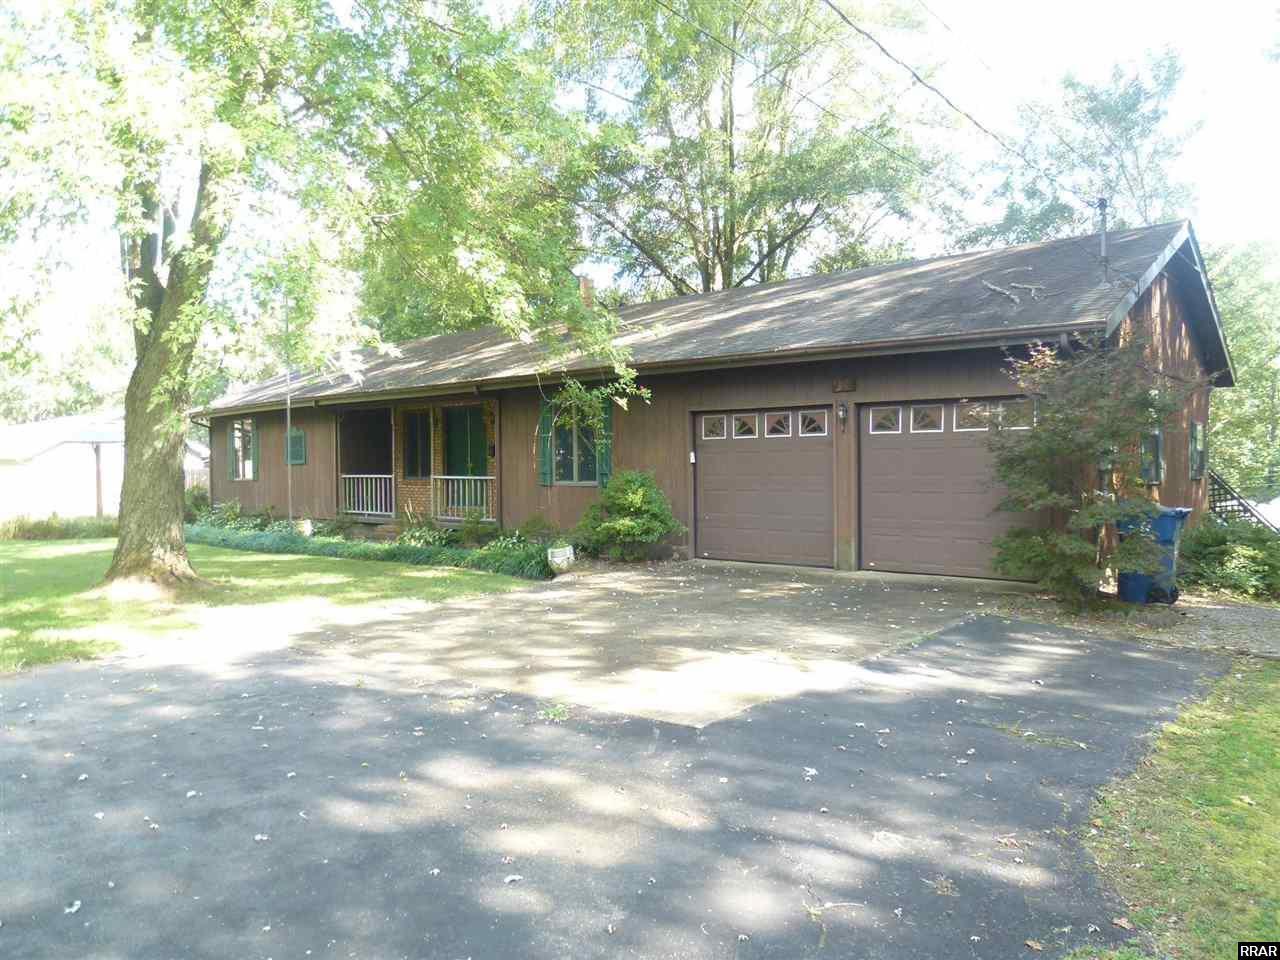 8787 Tibbs Ln, South Fulton, TN 38257 - 2 Bed, 2 Bath Single-Family Home -  MLS #40698 - 20 Photos | Trulia